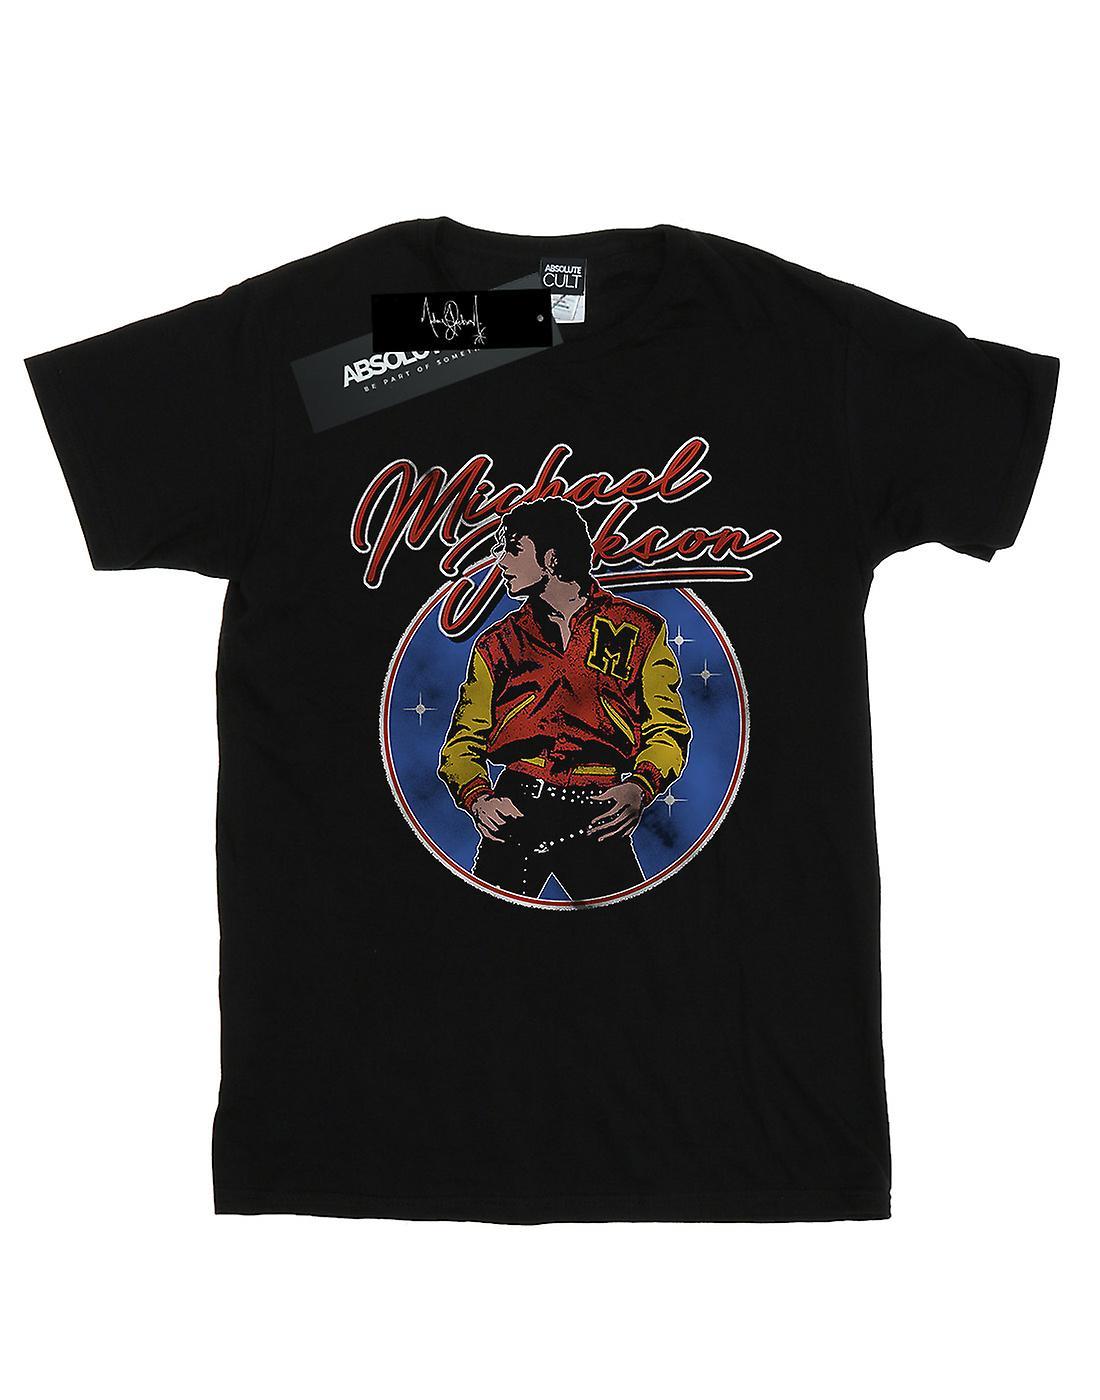 Michael Jackson Women's Circle Thriller Crest Boyfriend Fit T-Shirt